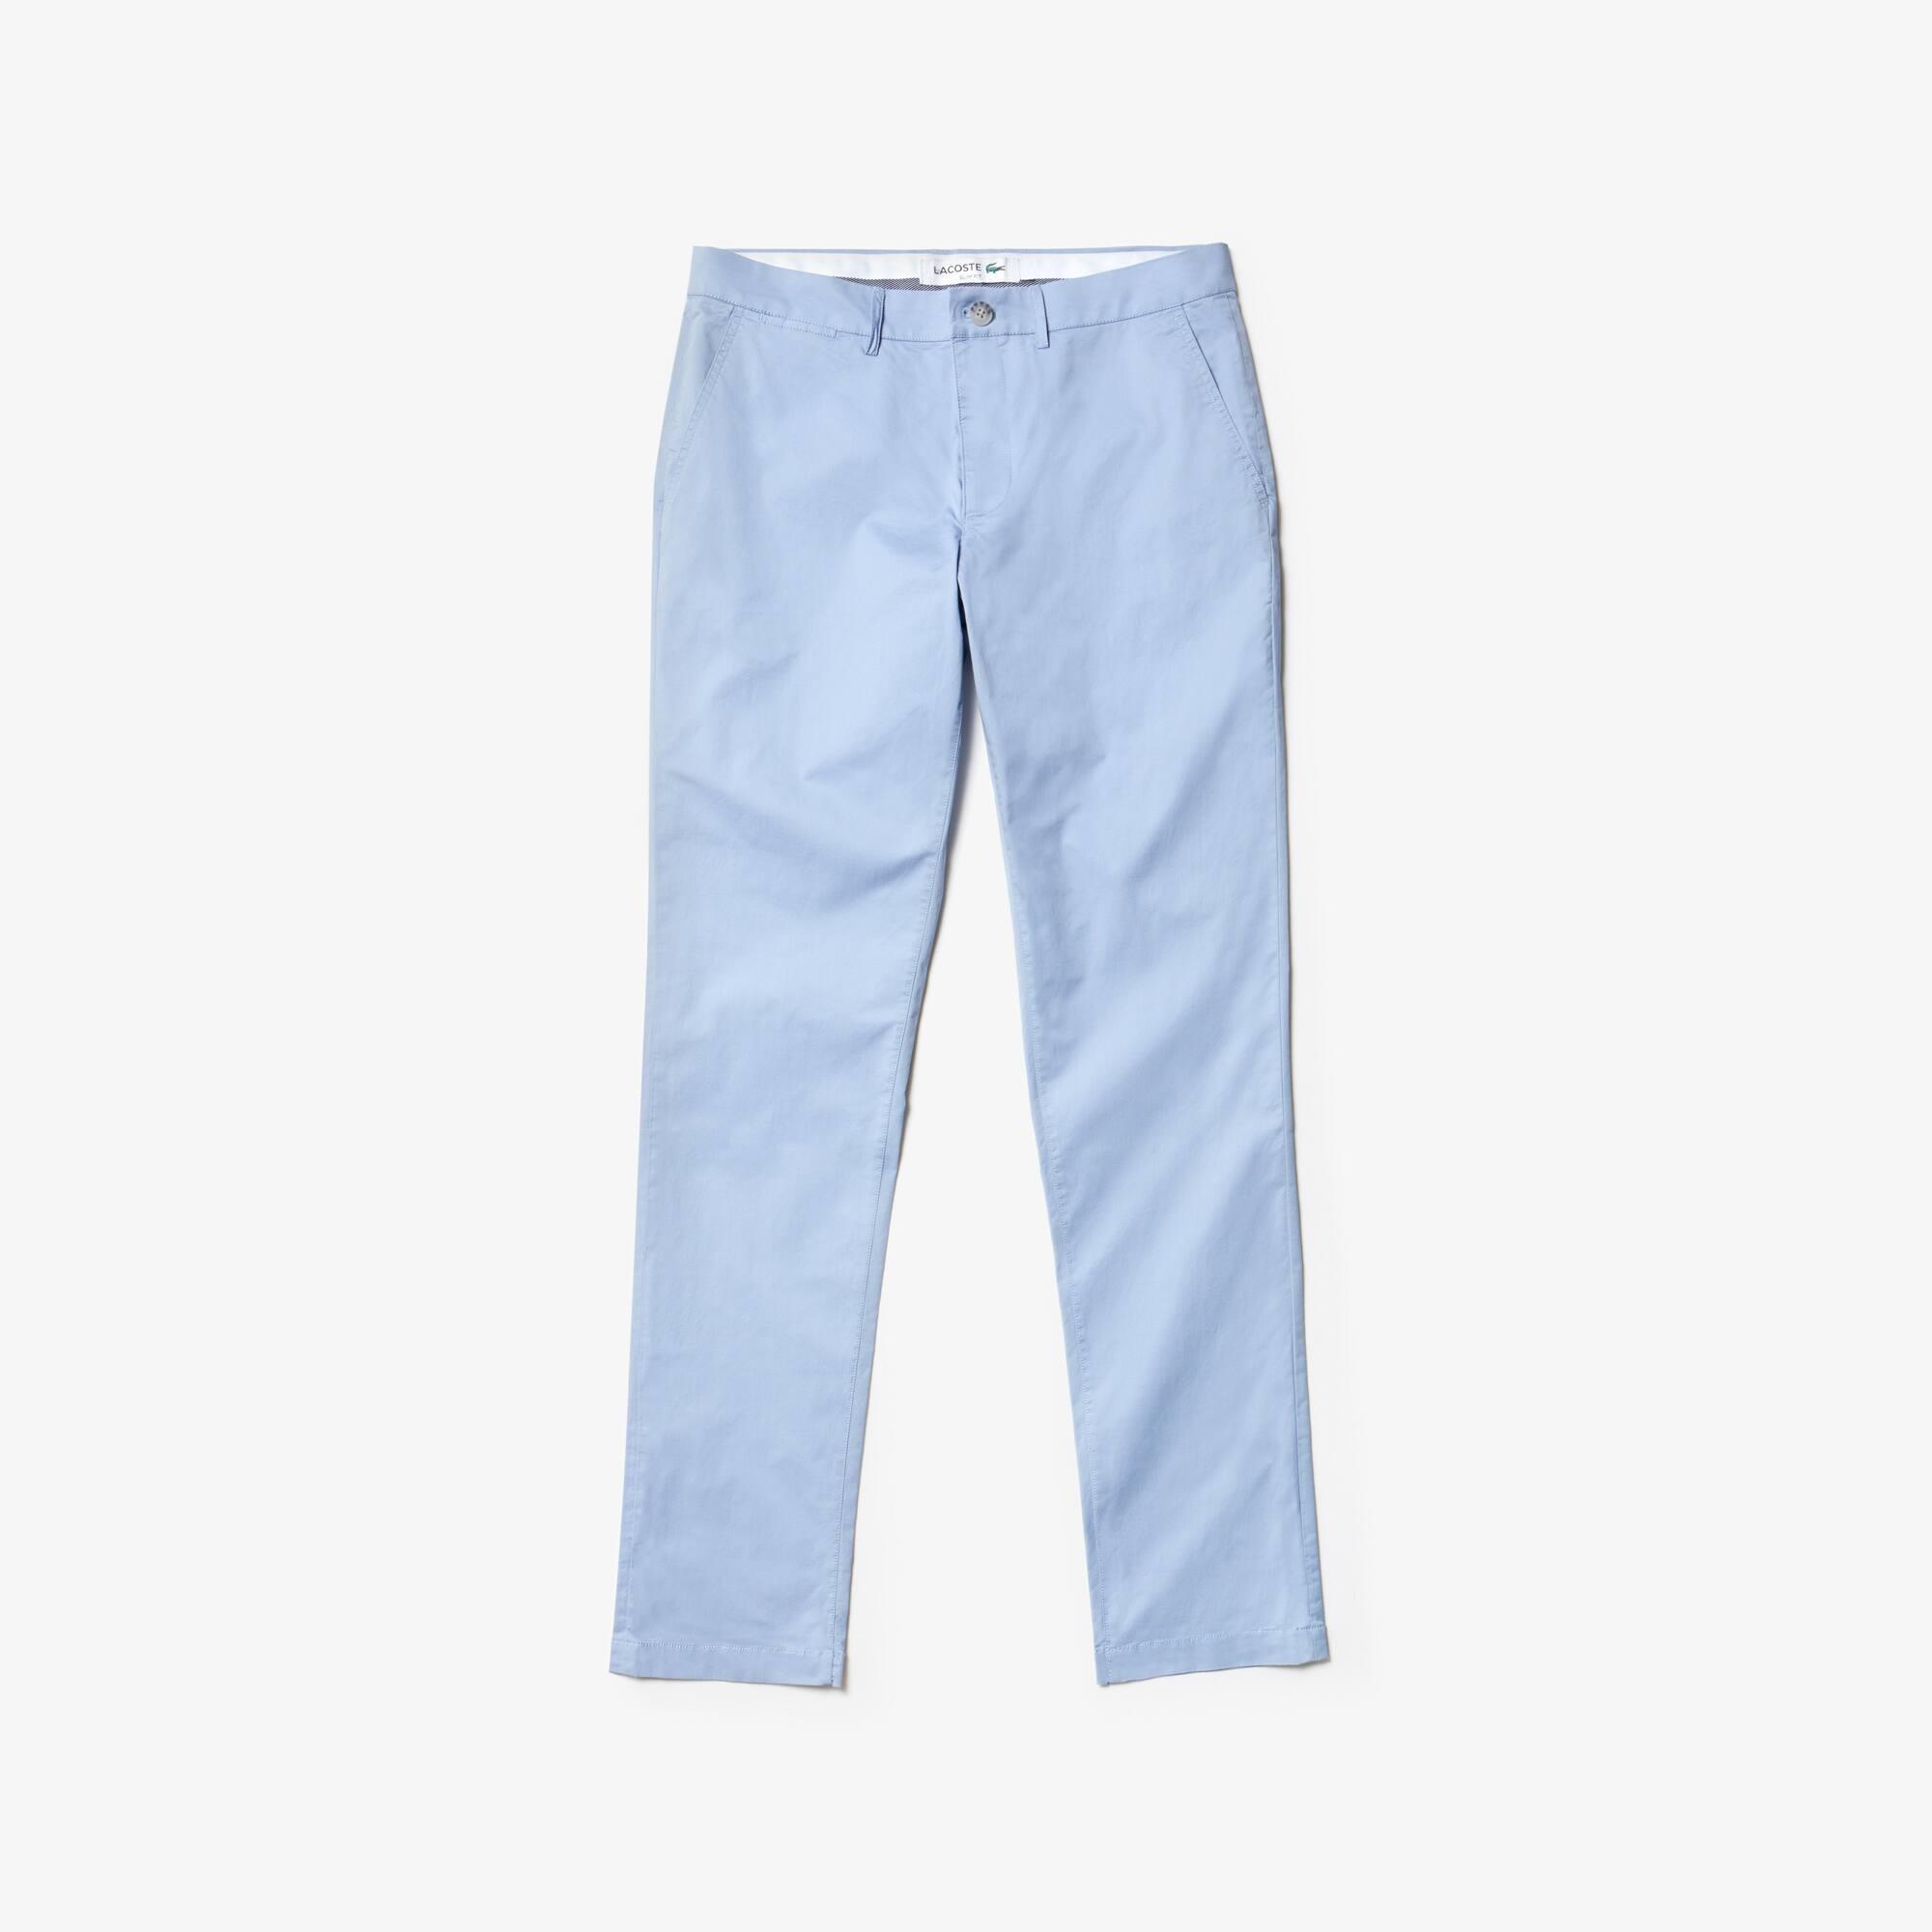 Bermudas amp; Pantalons Lacoste Bermudas Homme Pantalons amp; Rw8qxdz8